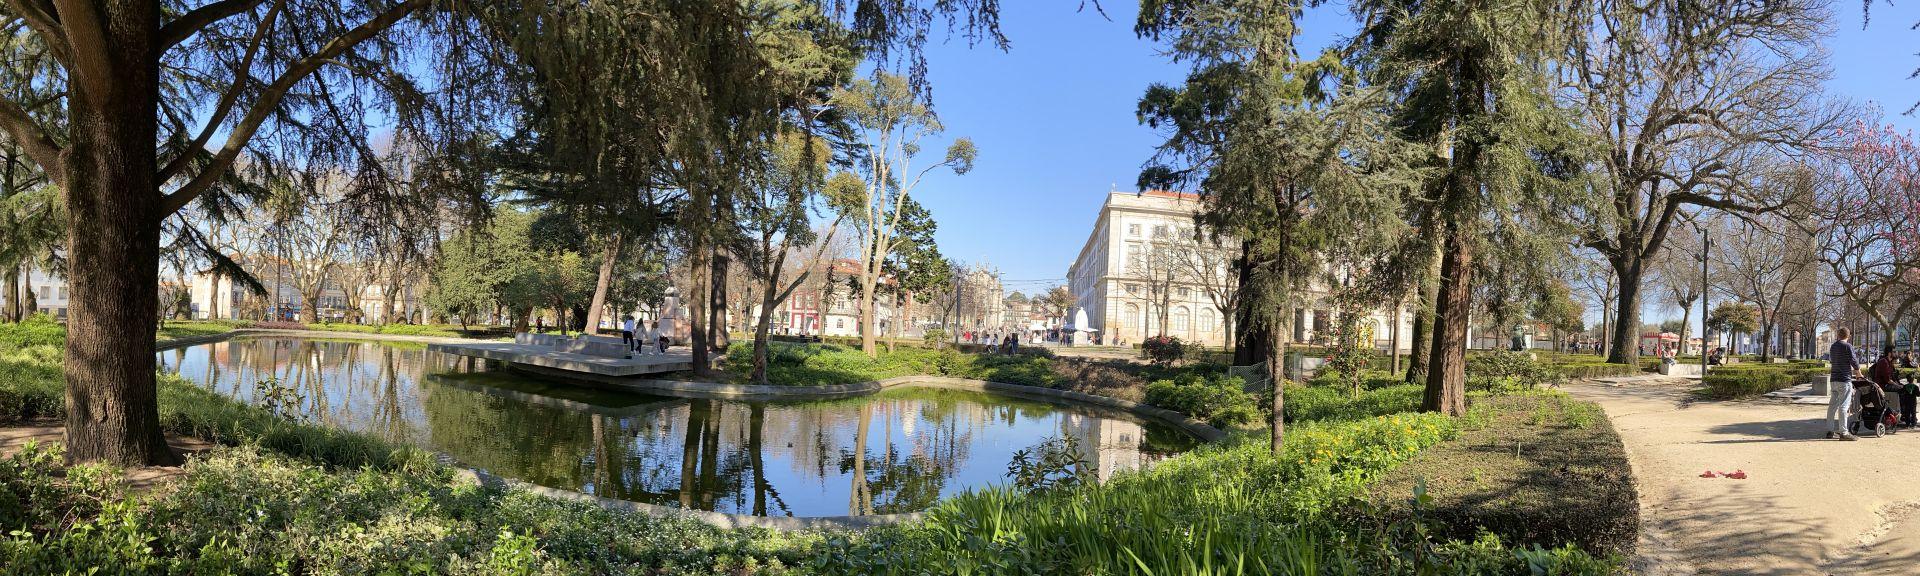 Jardim do Cordoaria